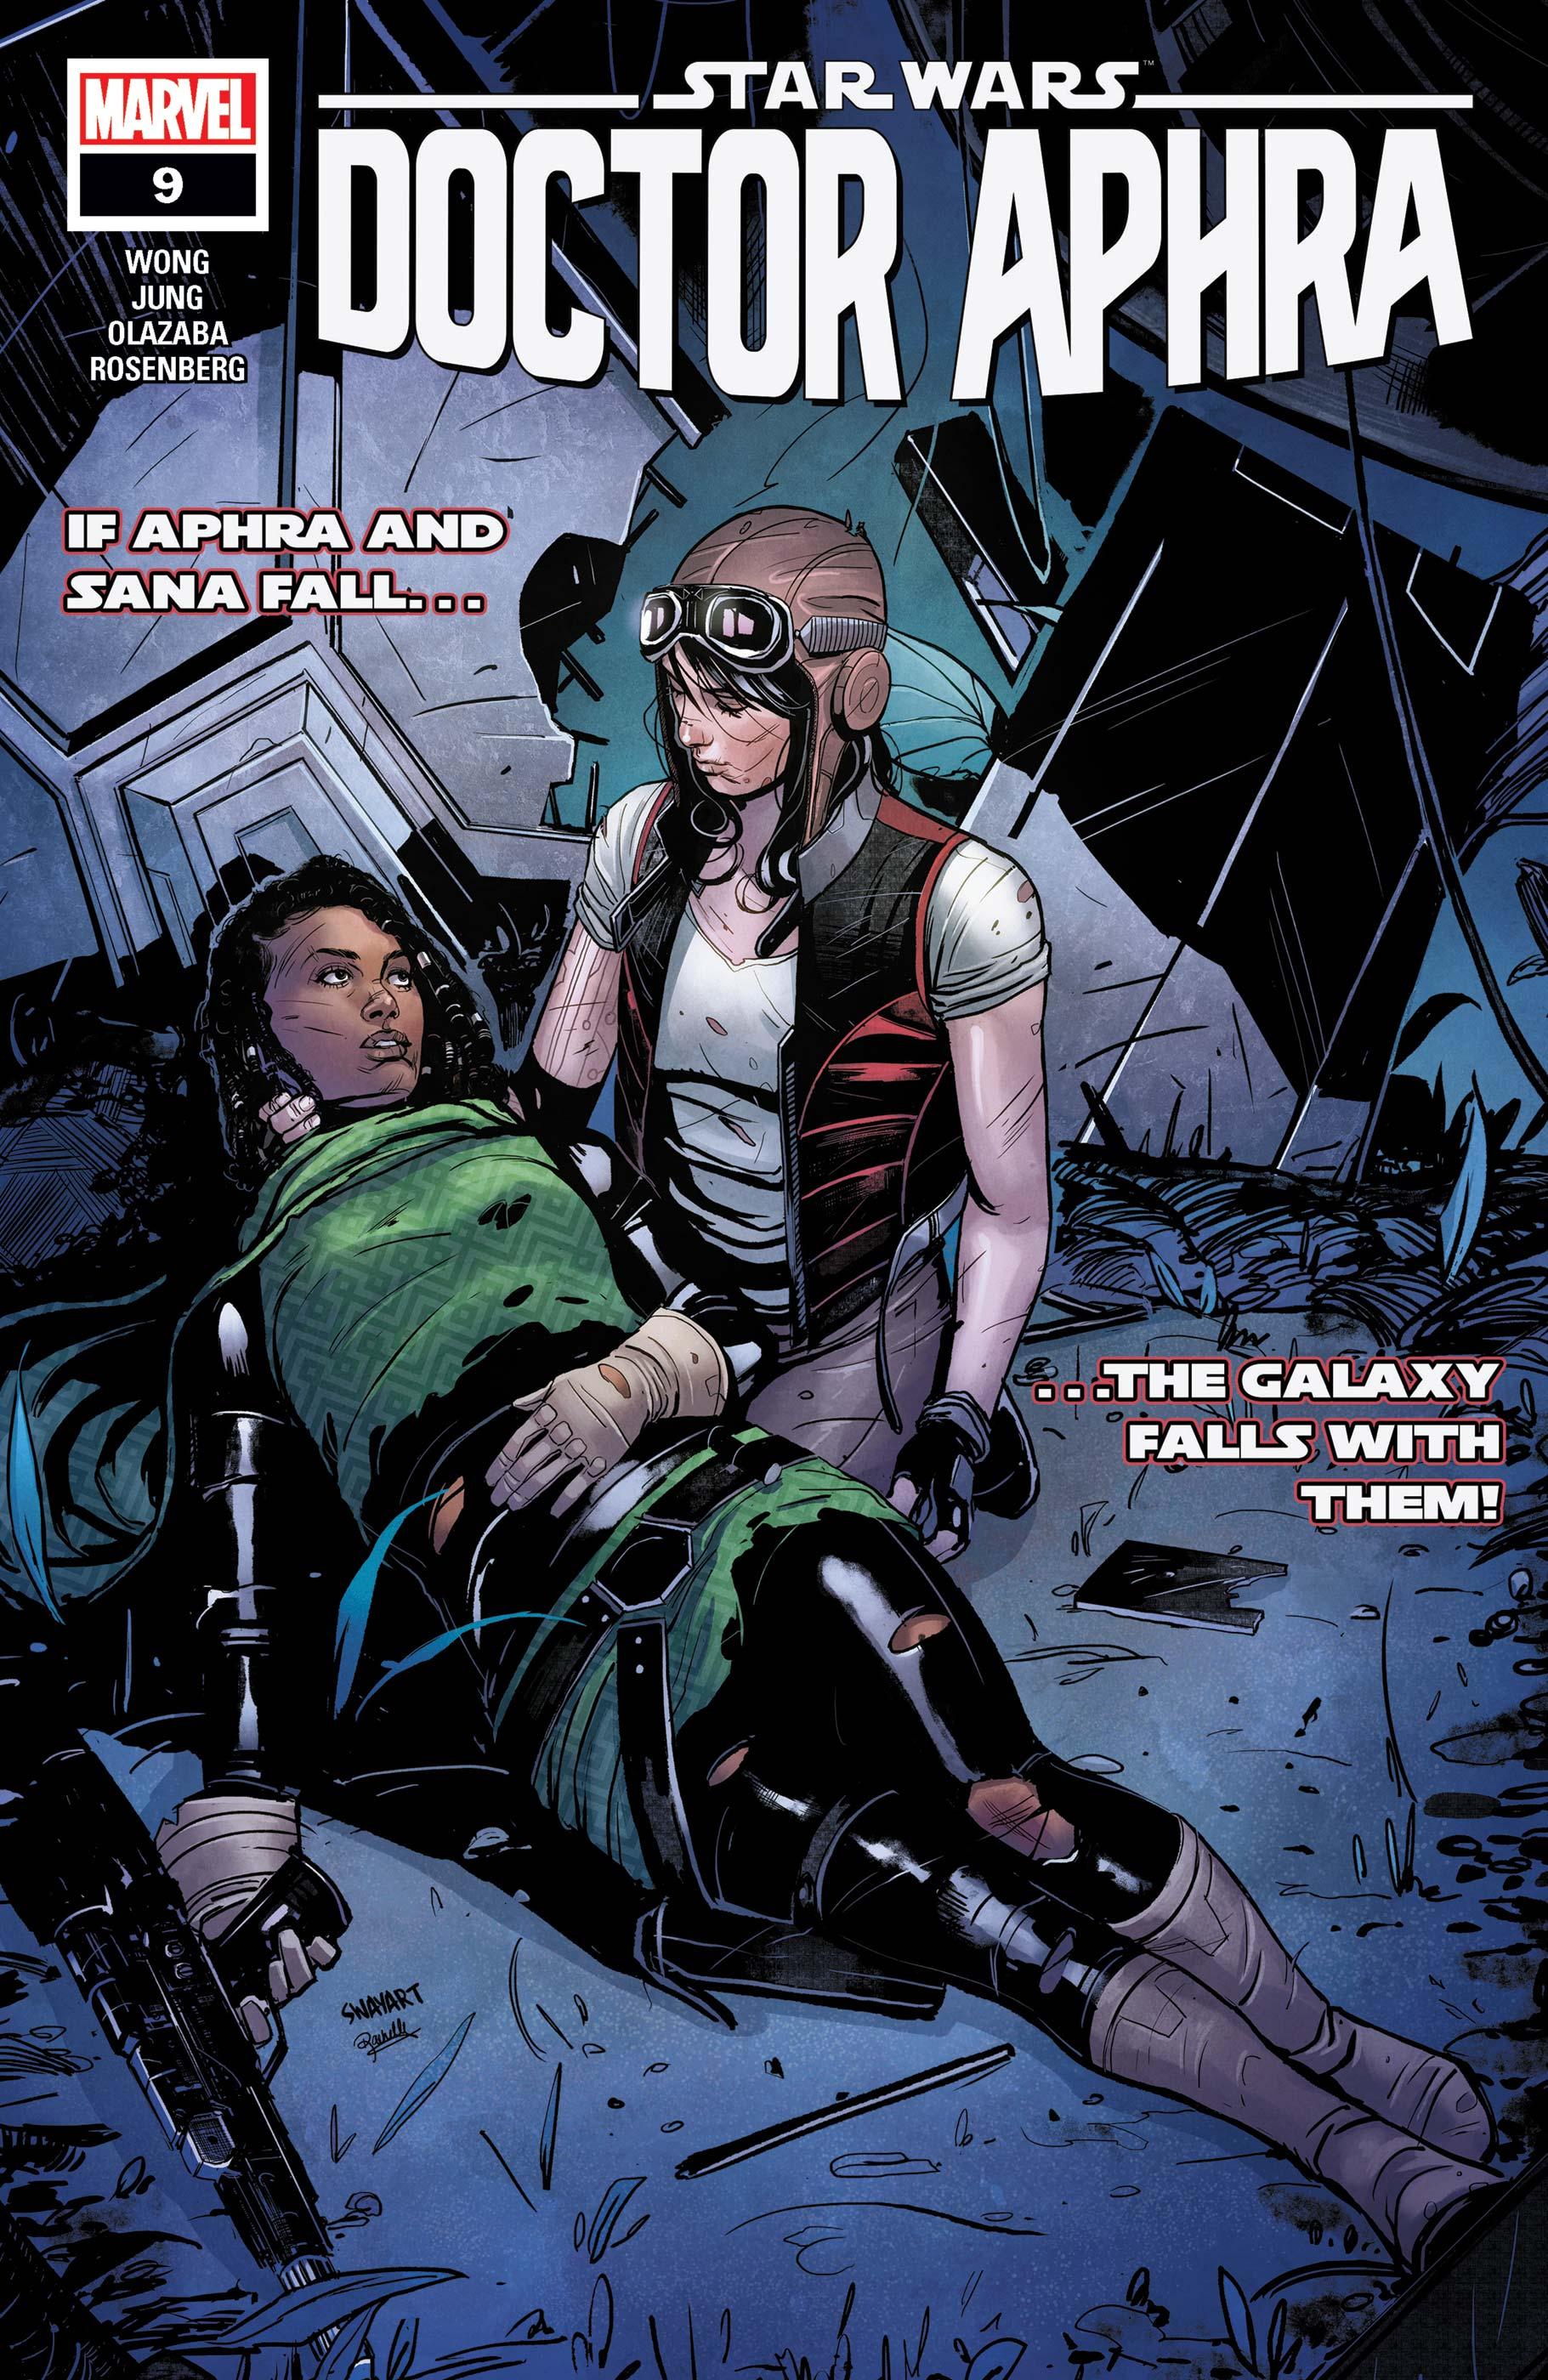 Star Wars: Doctor Aphra (2020) #9